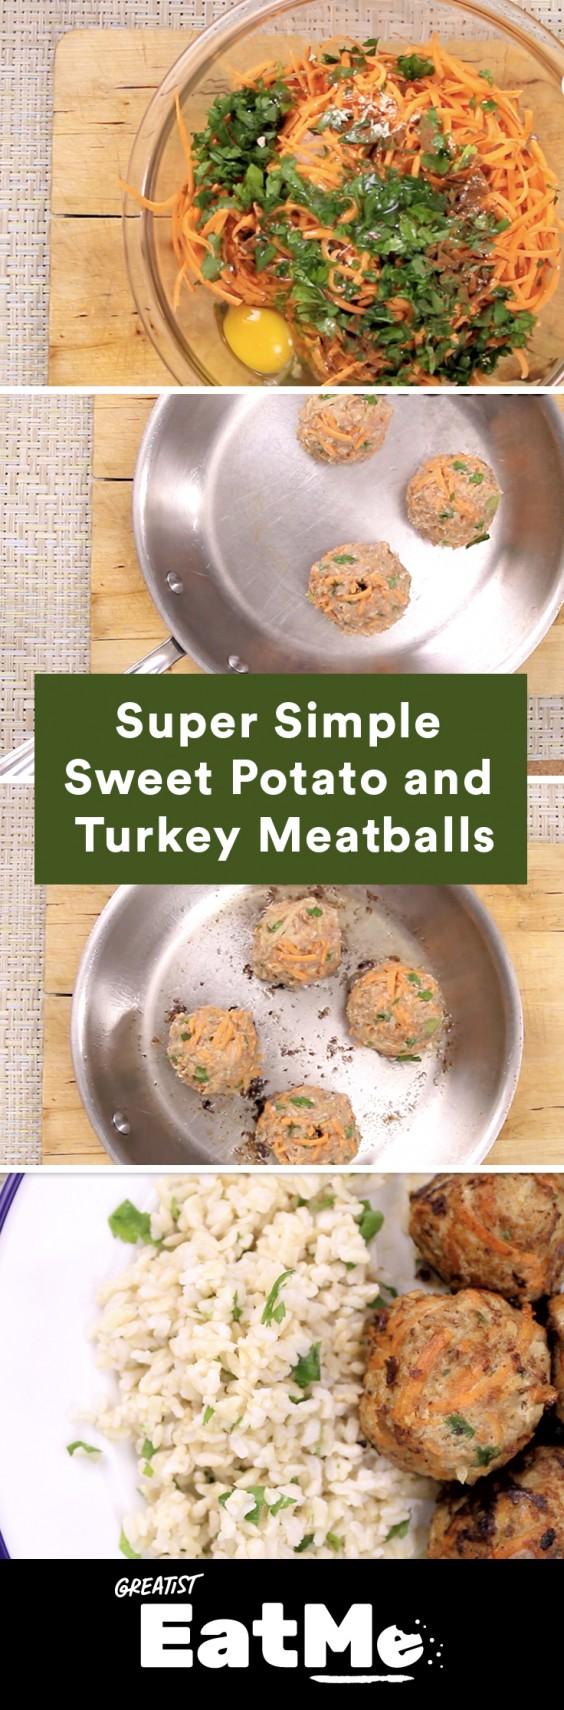 Eat Me Video: Turkey Meatballs